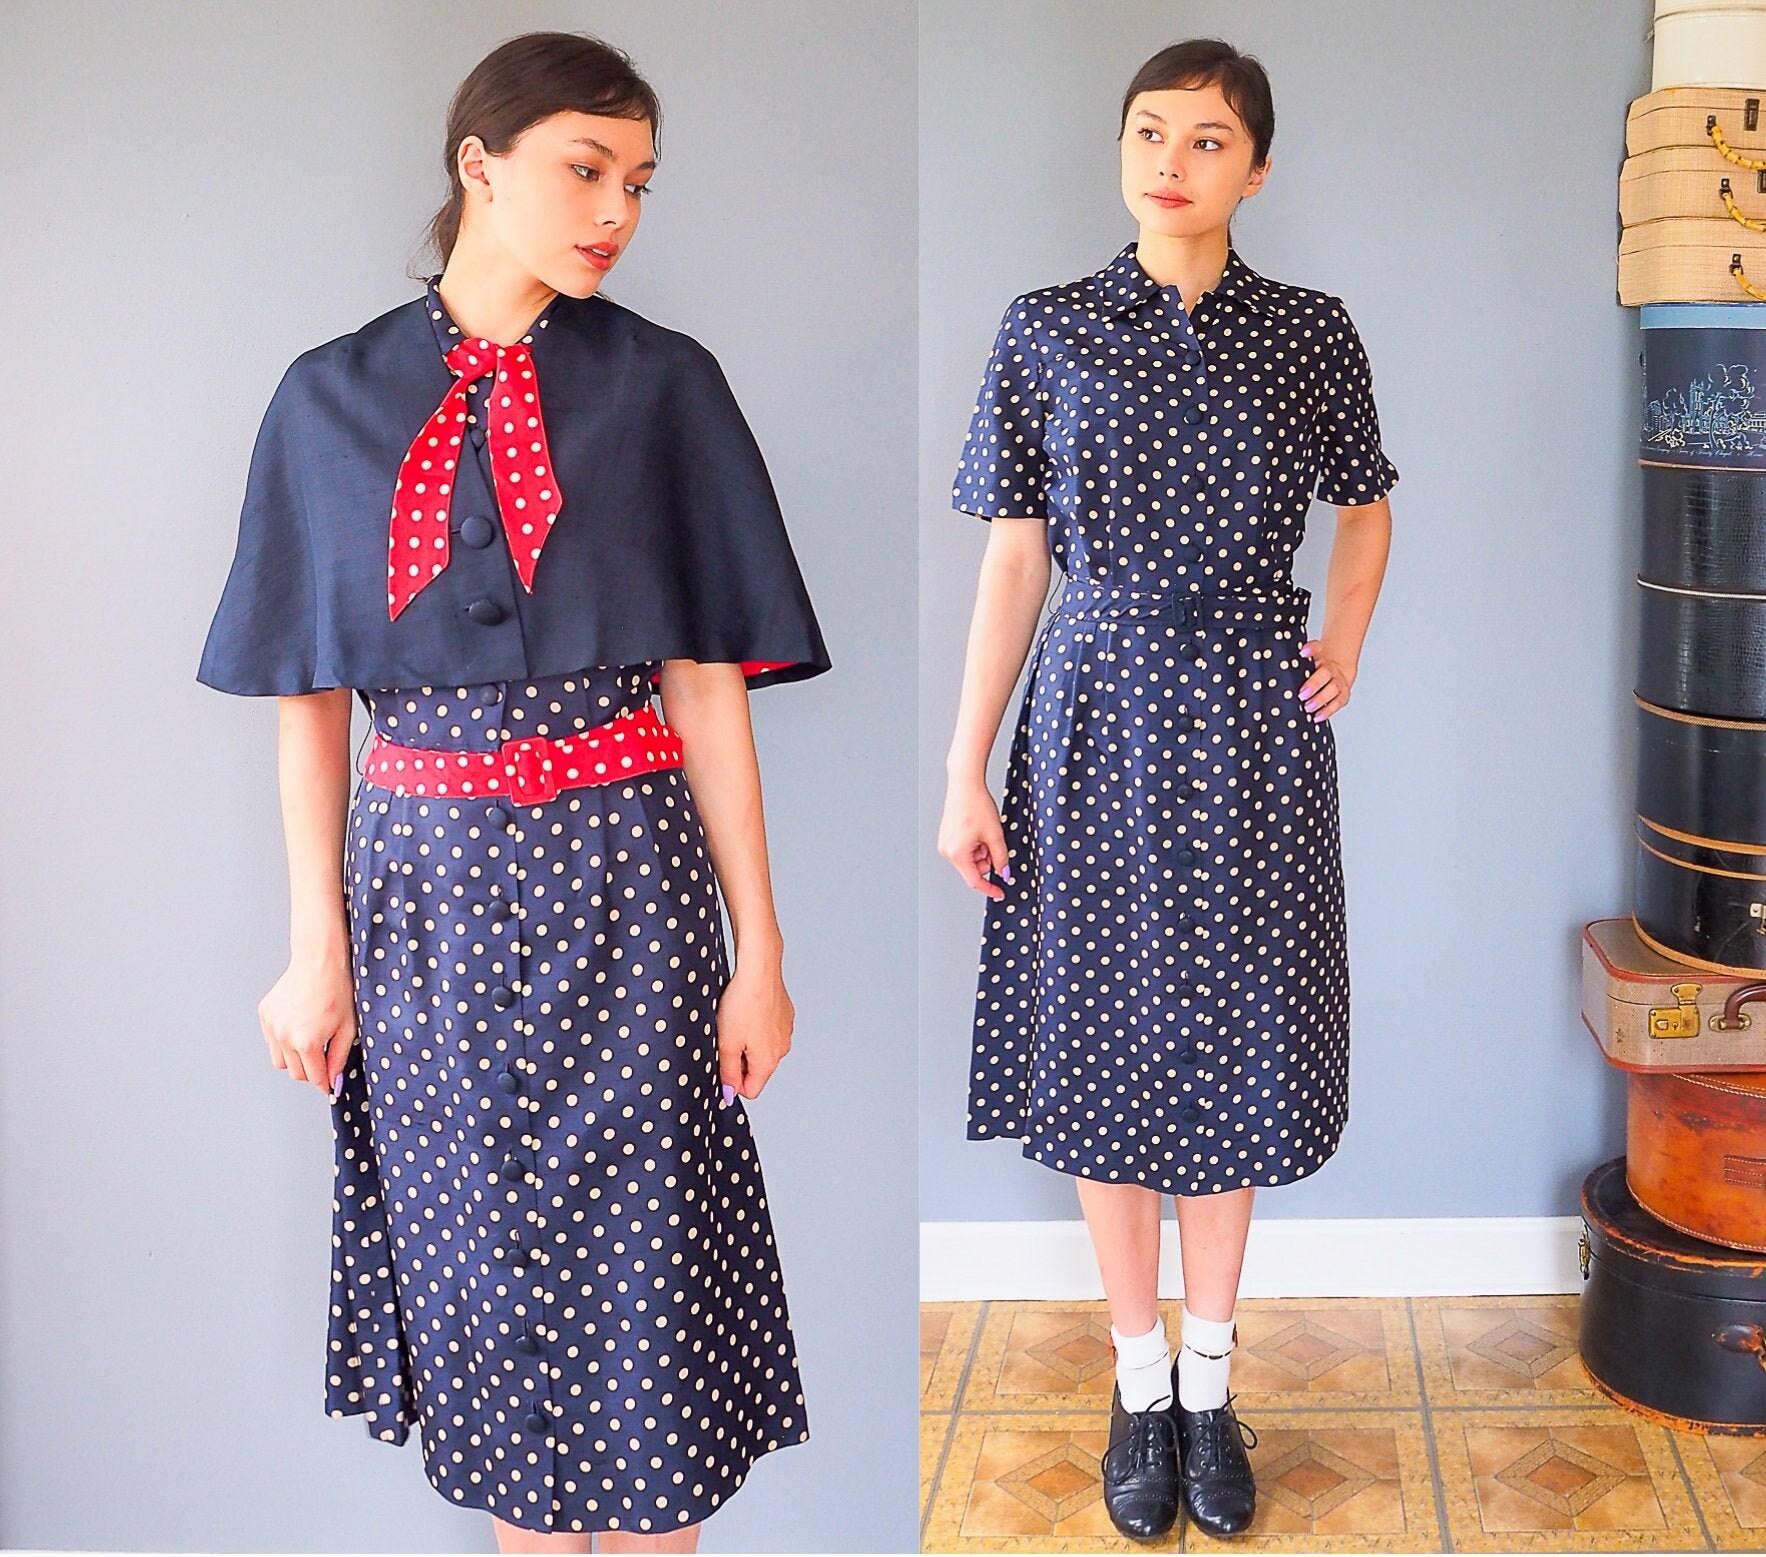 Vintage Scarf Styles -1920s to 1960s Vintage 1950S Cape Polka Dot Dress  Bolero Jacket Size M Two Piece Dress Retro Clothing Day $220.00 AT vintagedancer.com